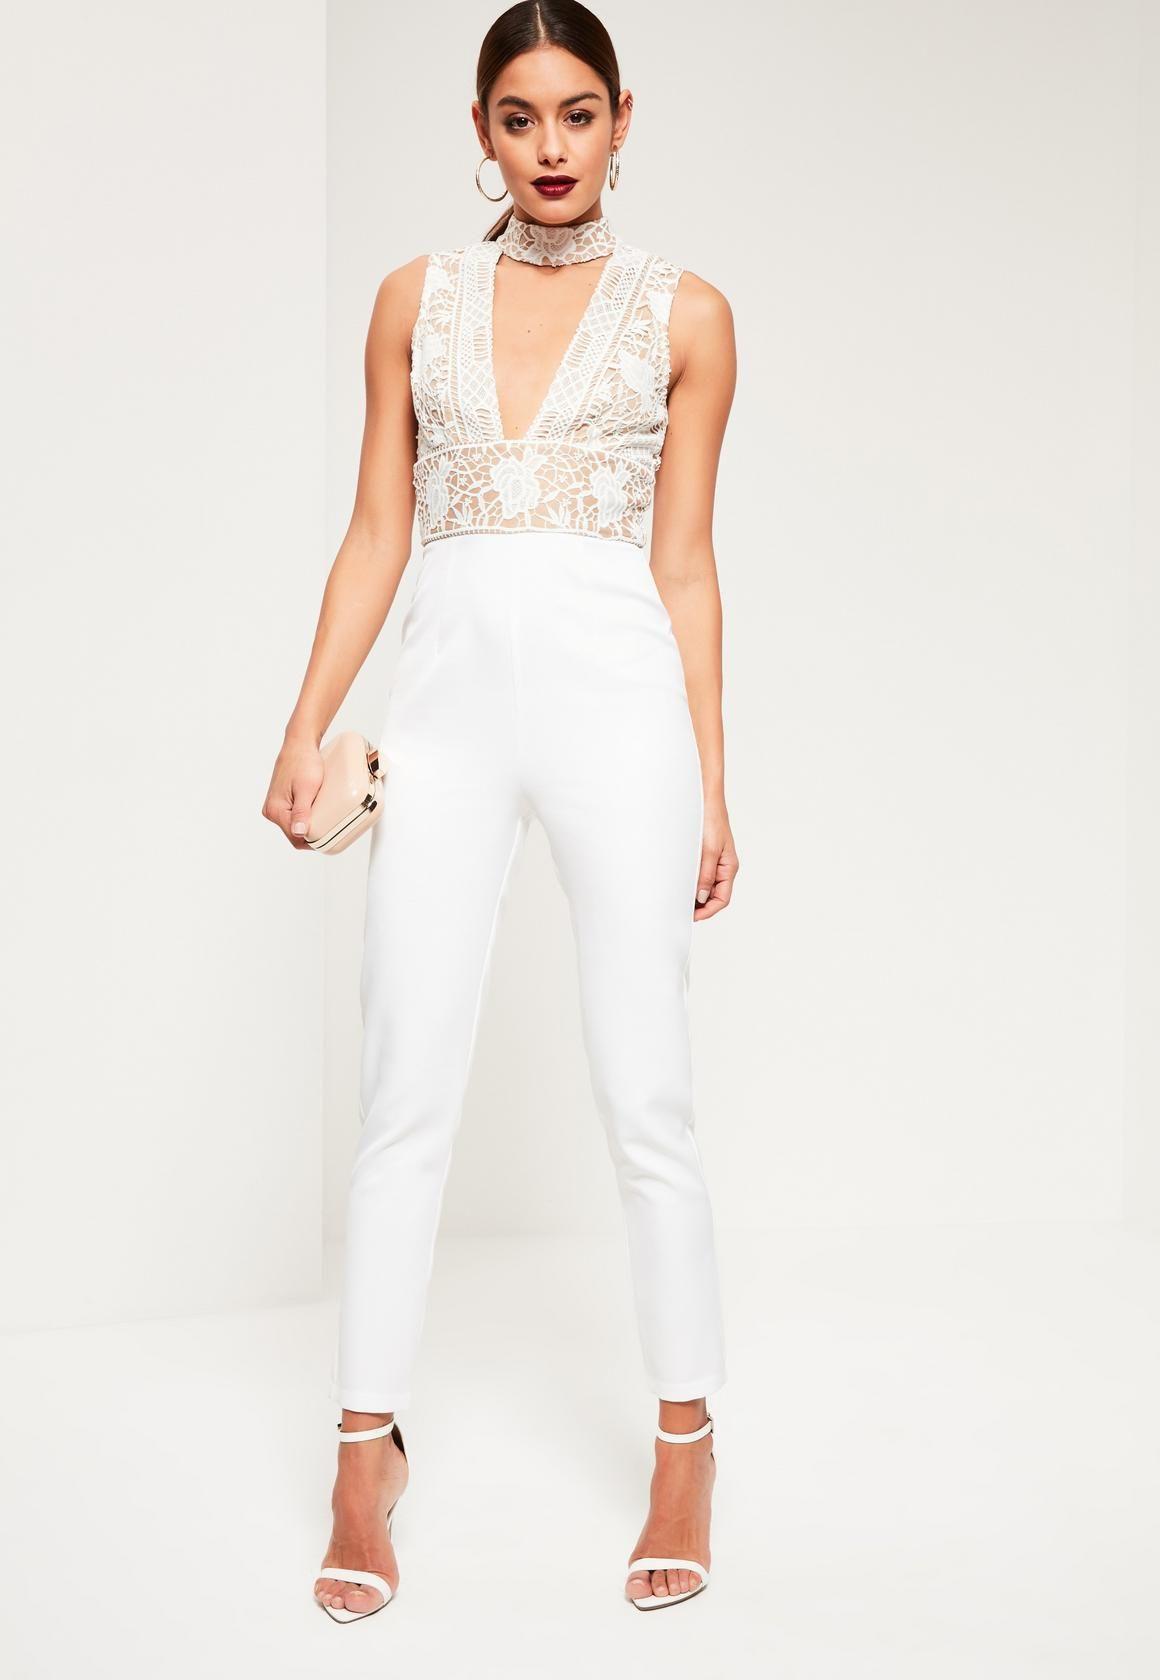 3e9a143f1ba Missguided - White Lace Top Choker Sleeveless Jumpsuit